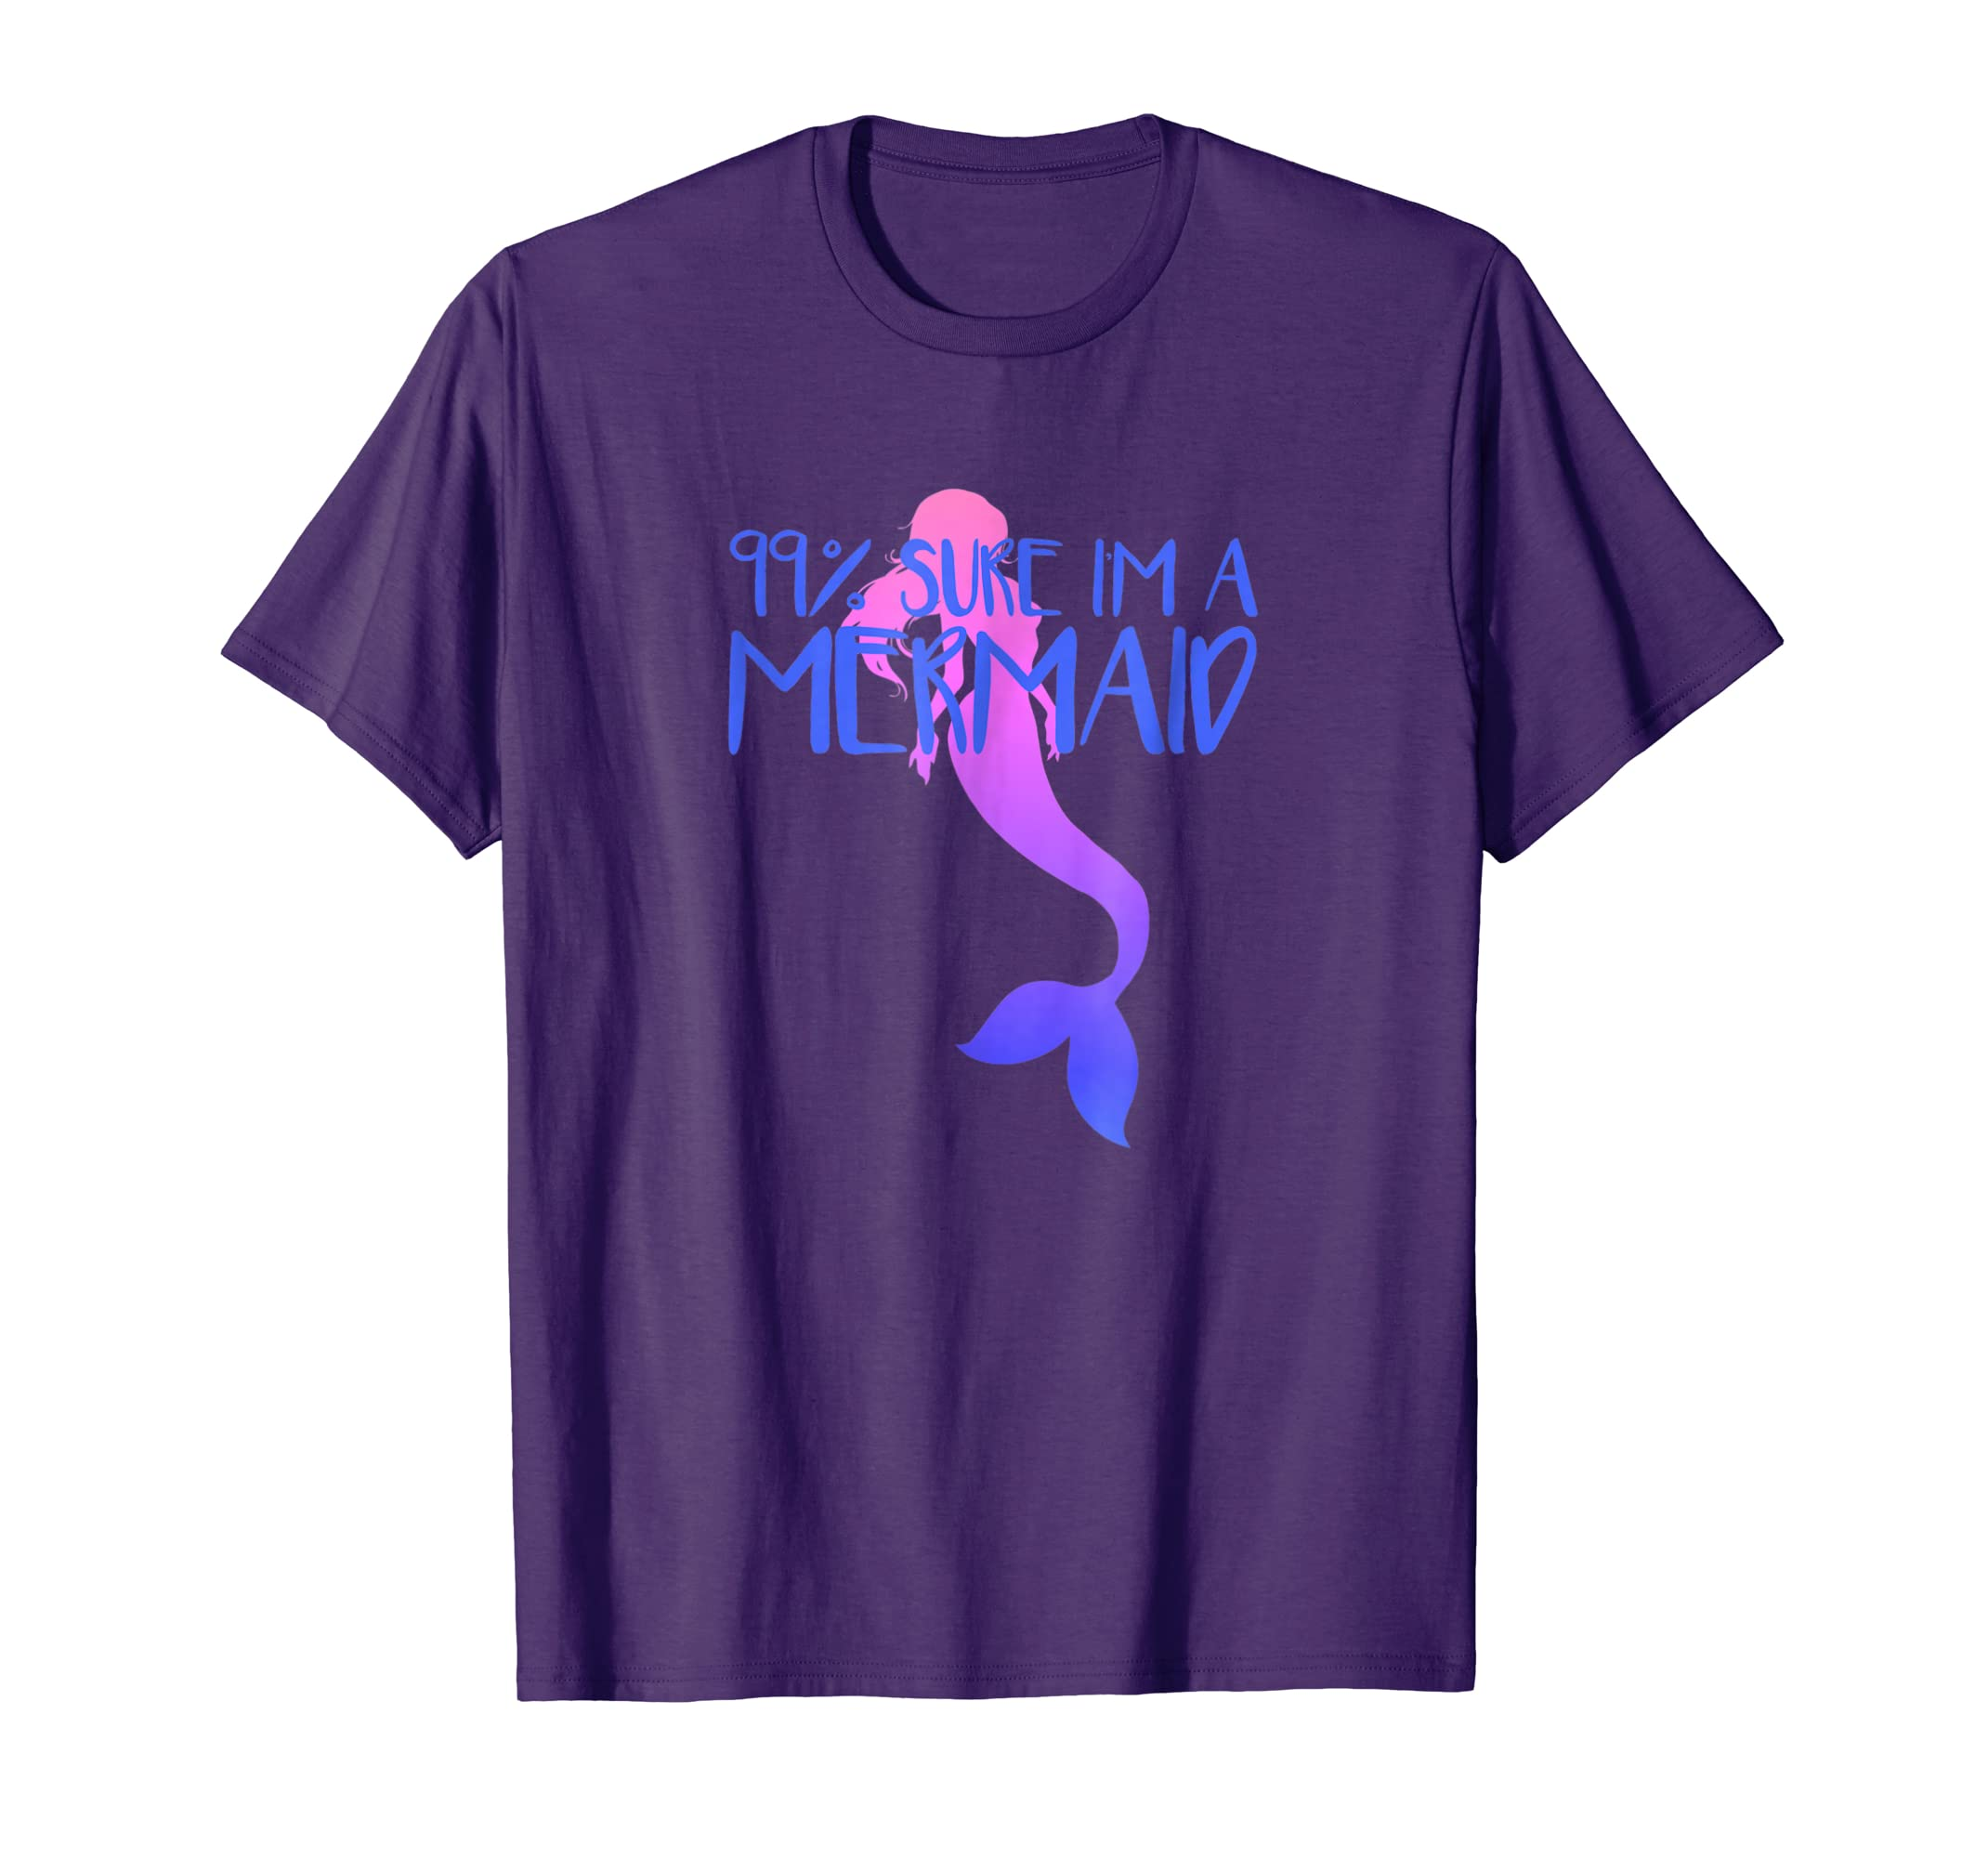 99% SURE I'M A MERMAID Lover T-Shirt Cute Kids Mom Tee Gift-AZP